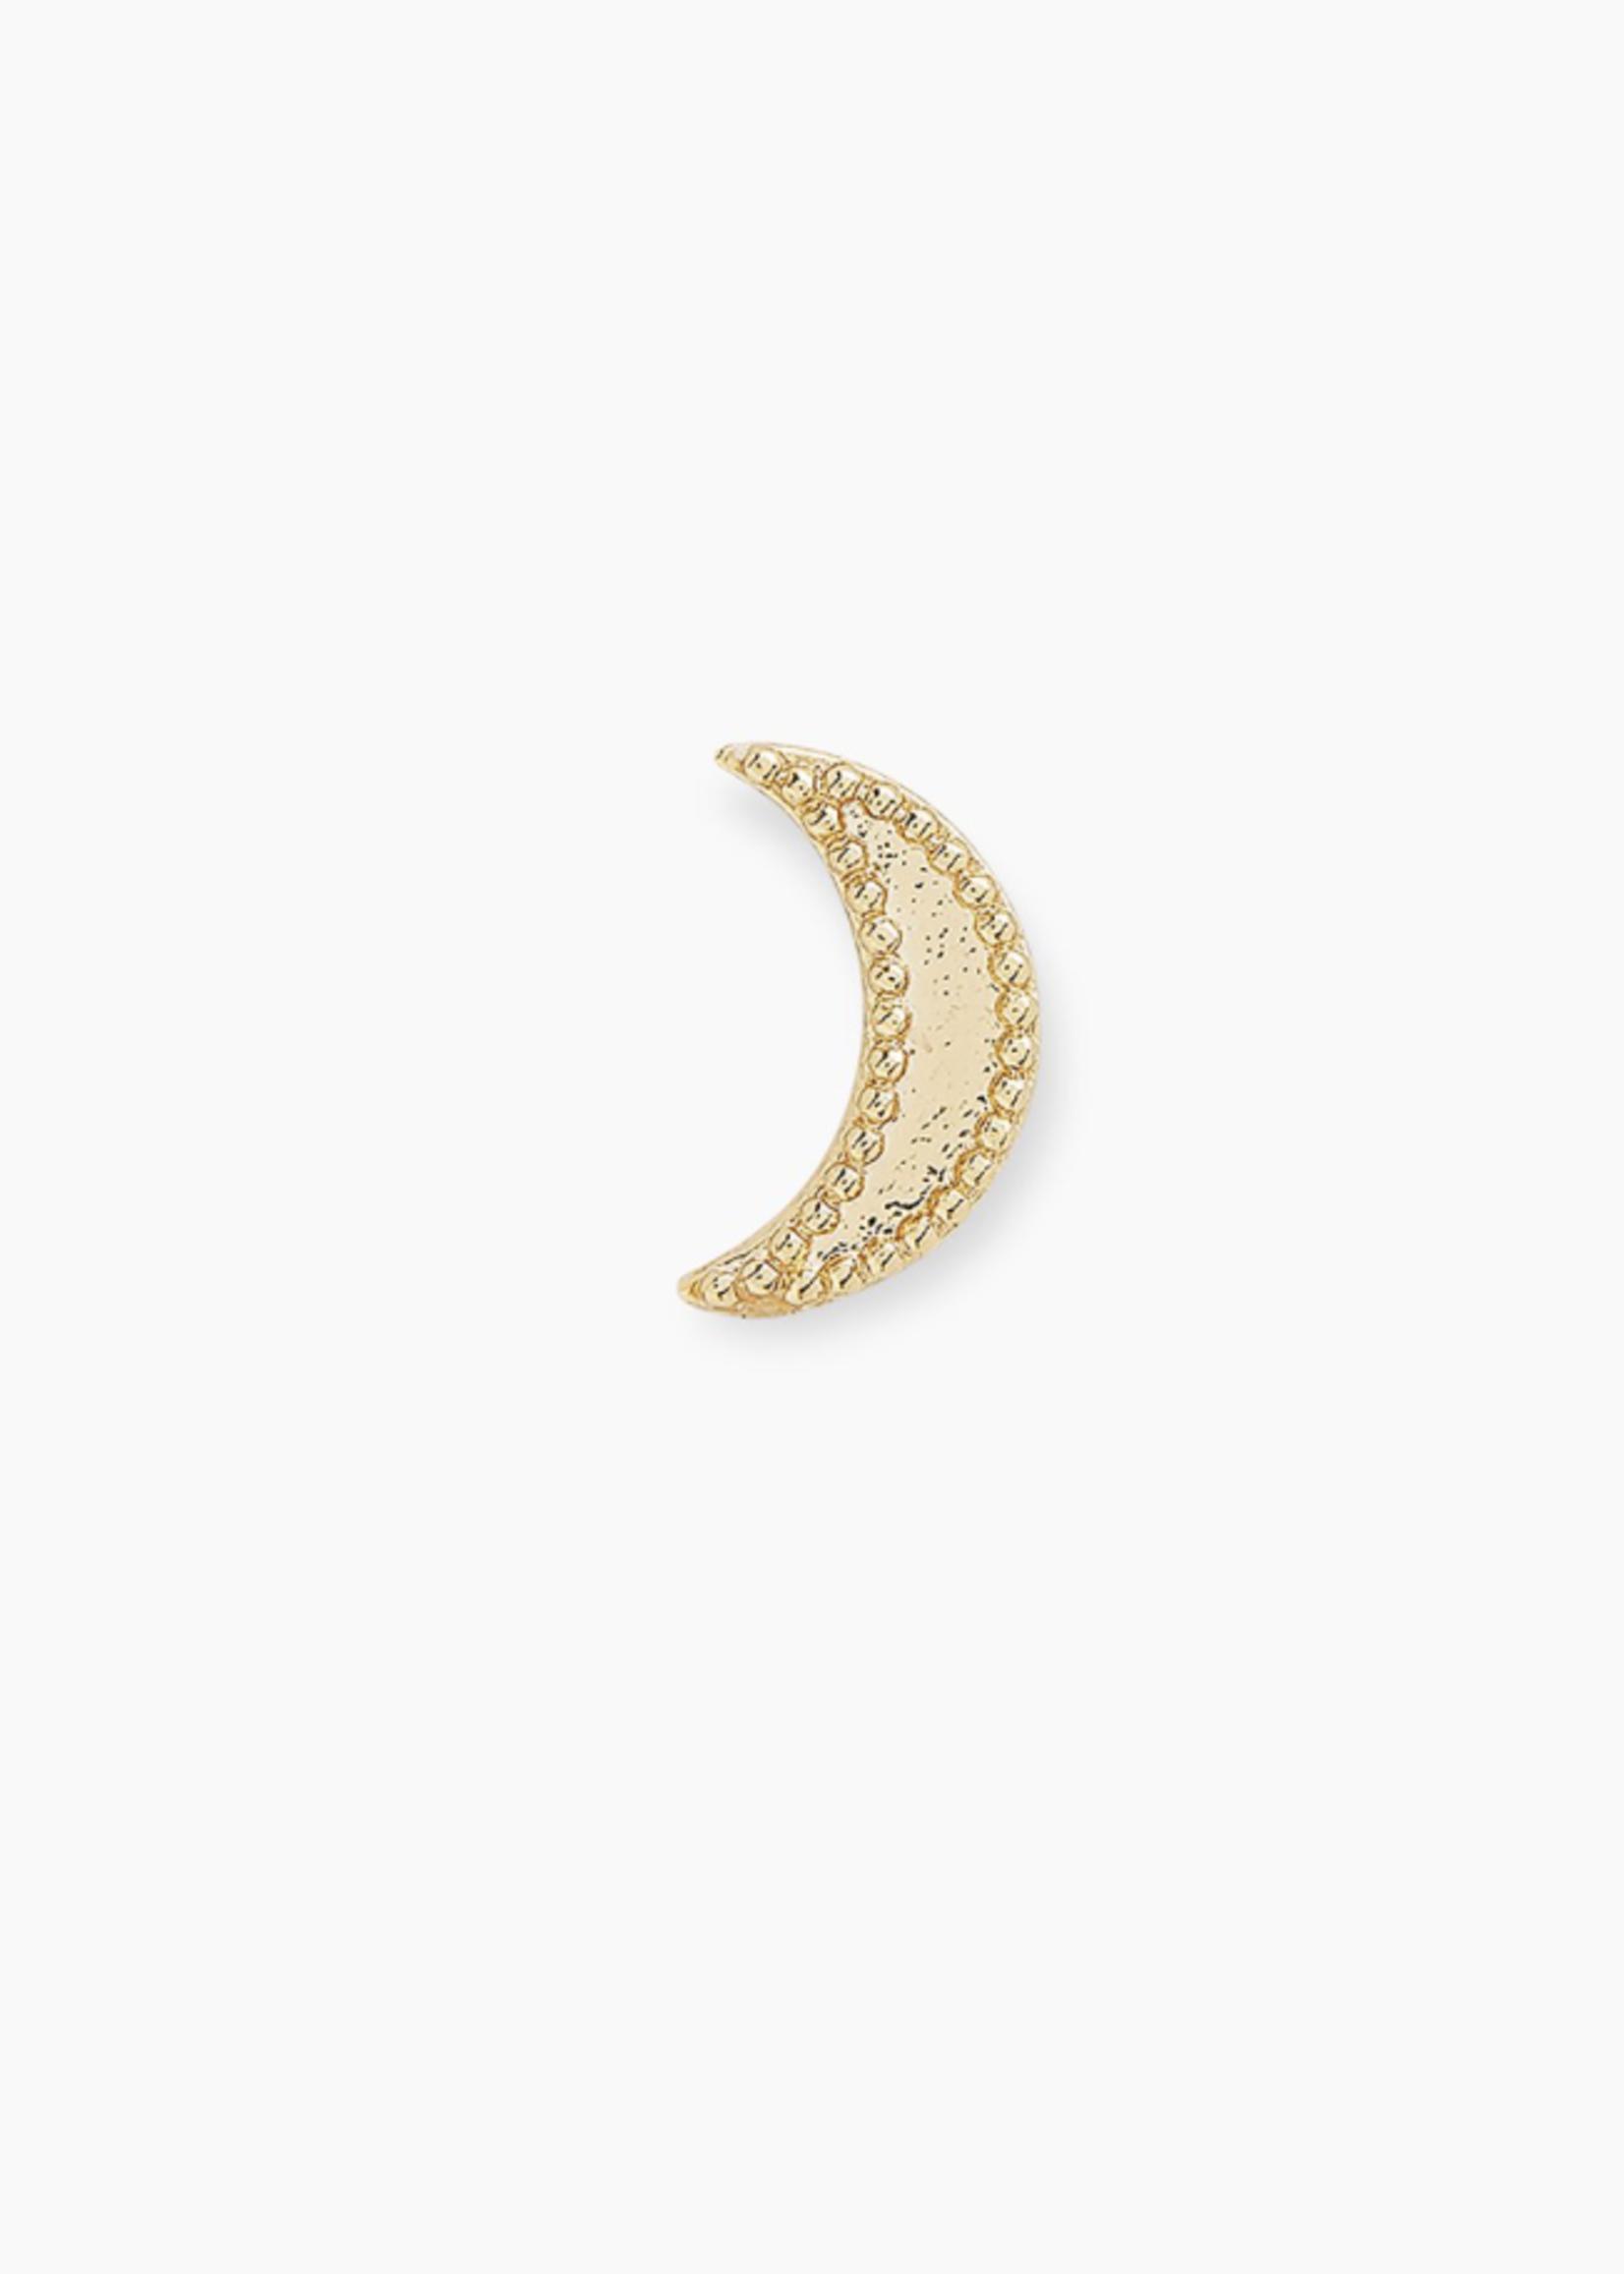 Gorjana Gorjana Moon Charm Stud